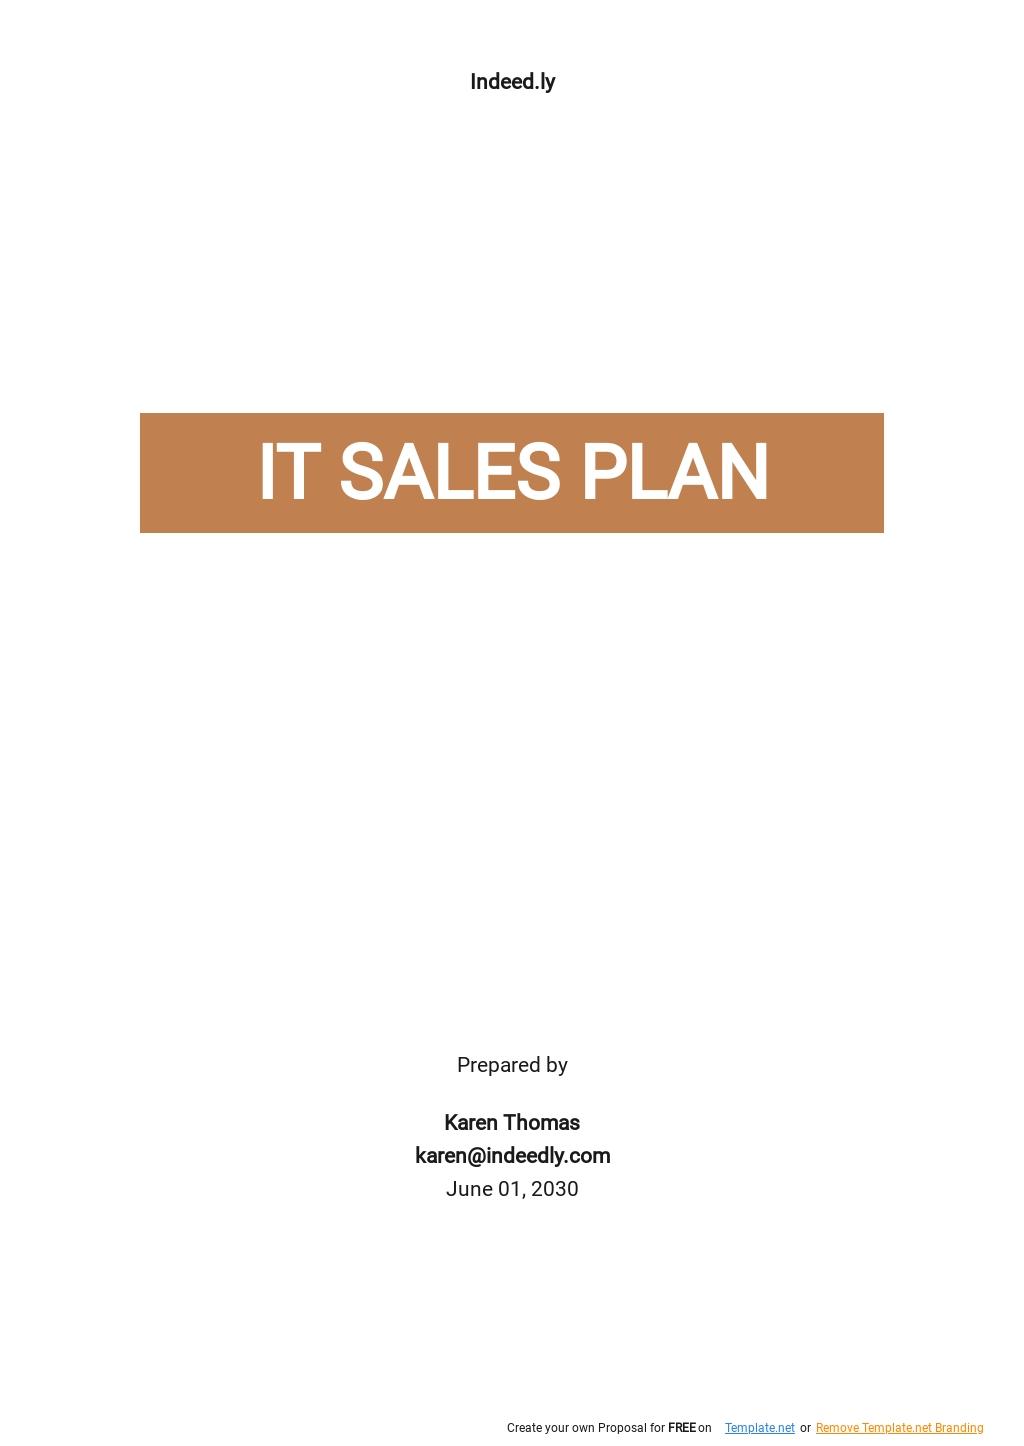 Sample IT Sales Plan Template.jpe